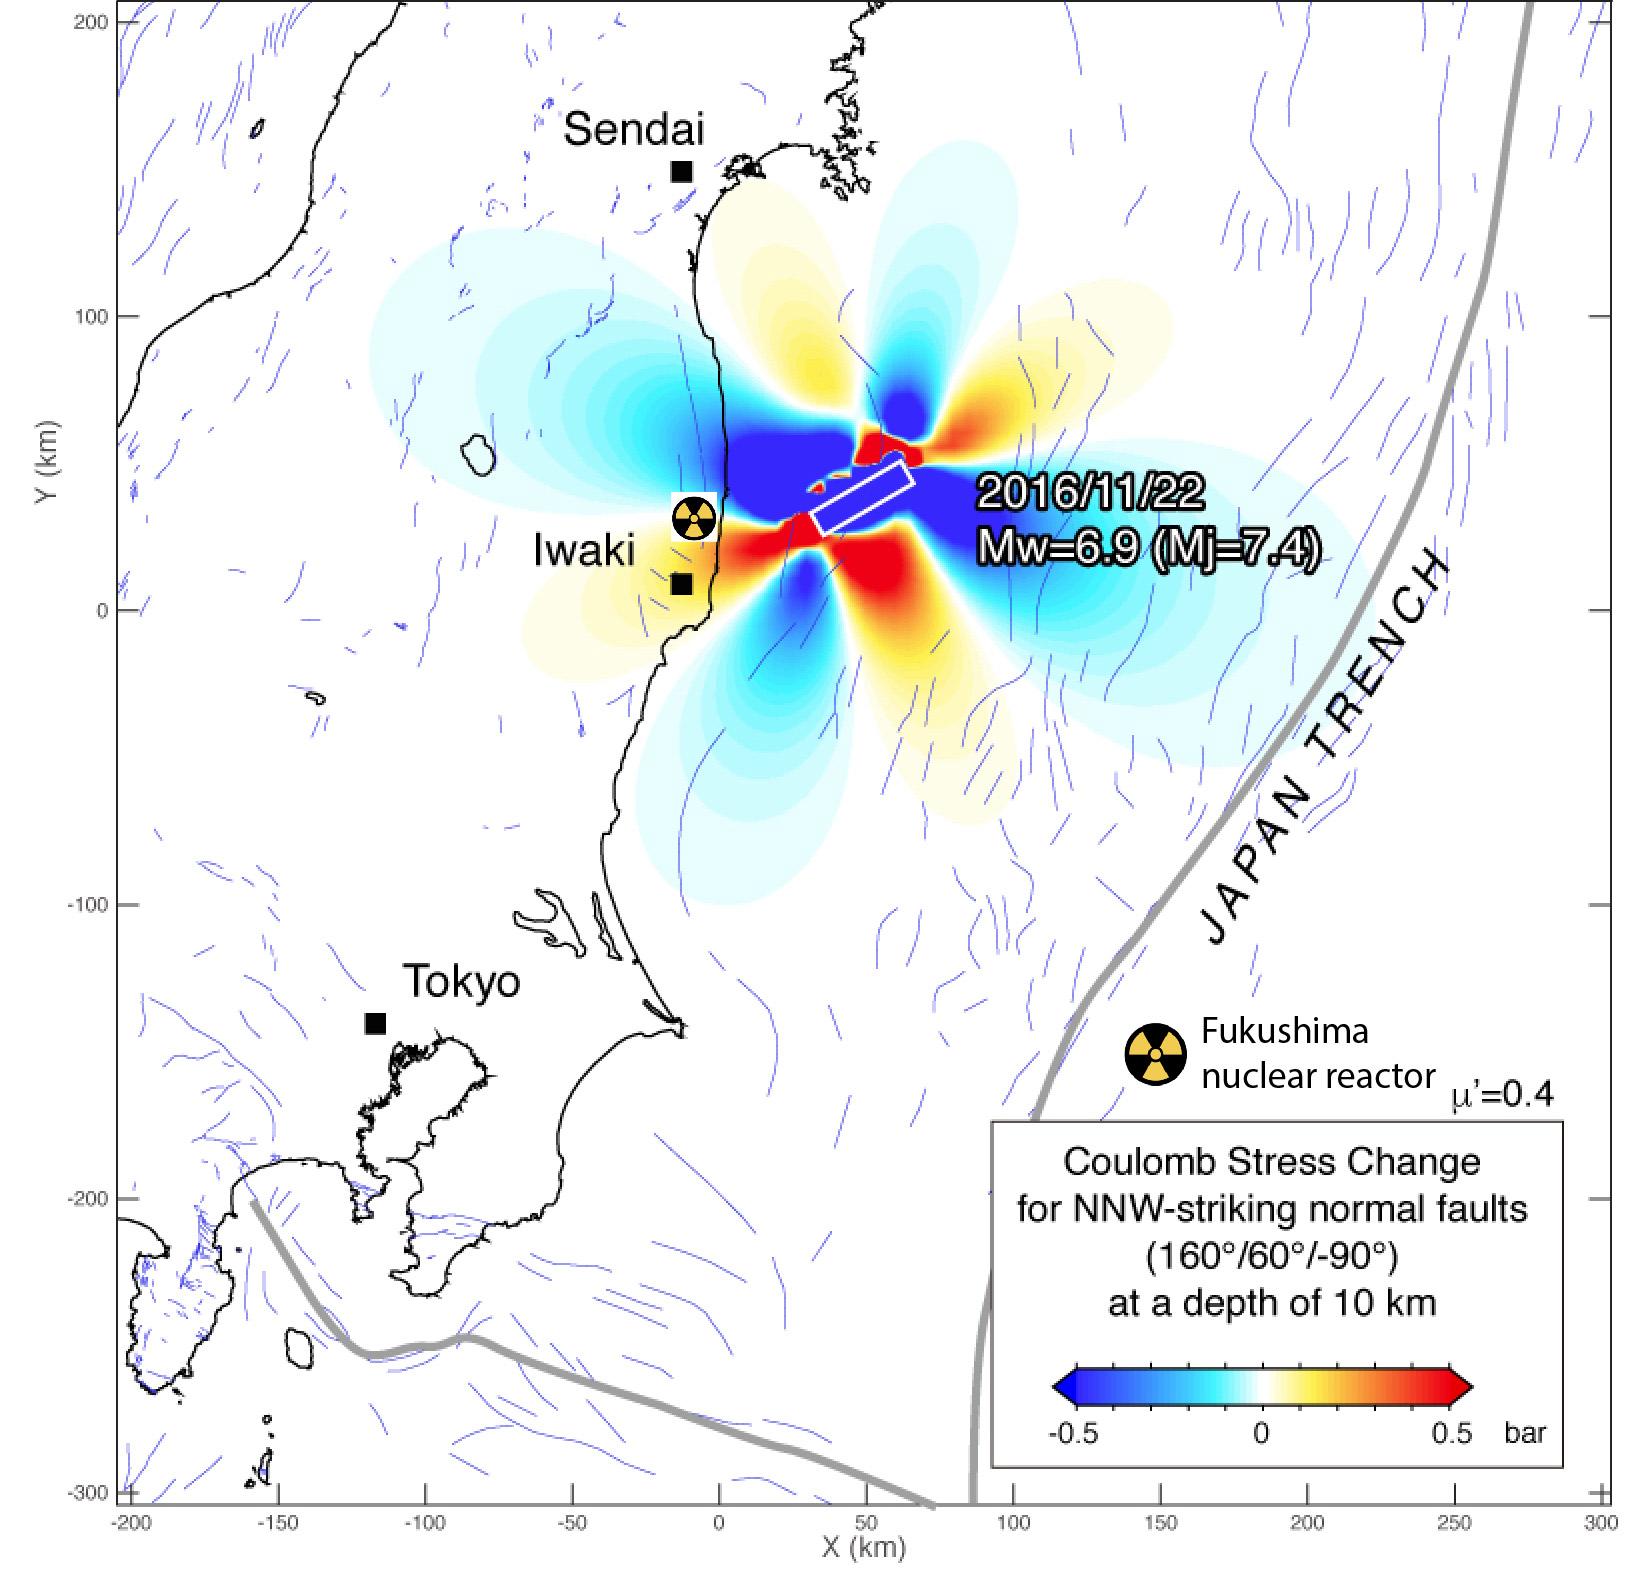 Japanearthquakemapcoulombanalysisfukushima Temblornet - Japan quake map 2016